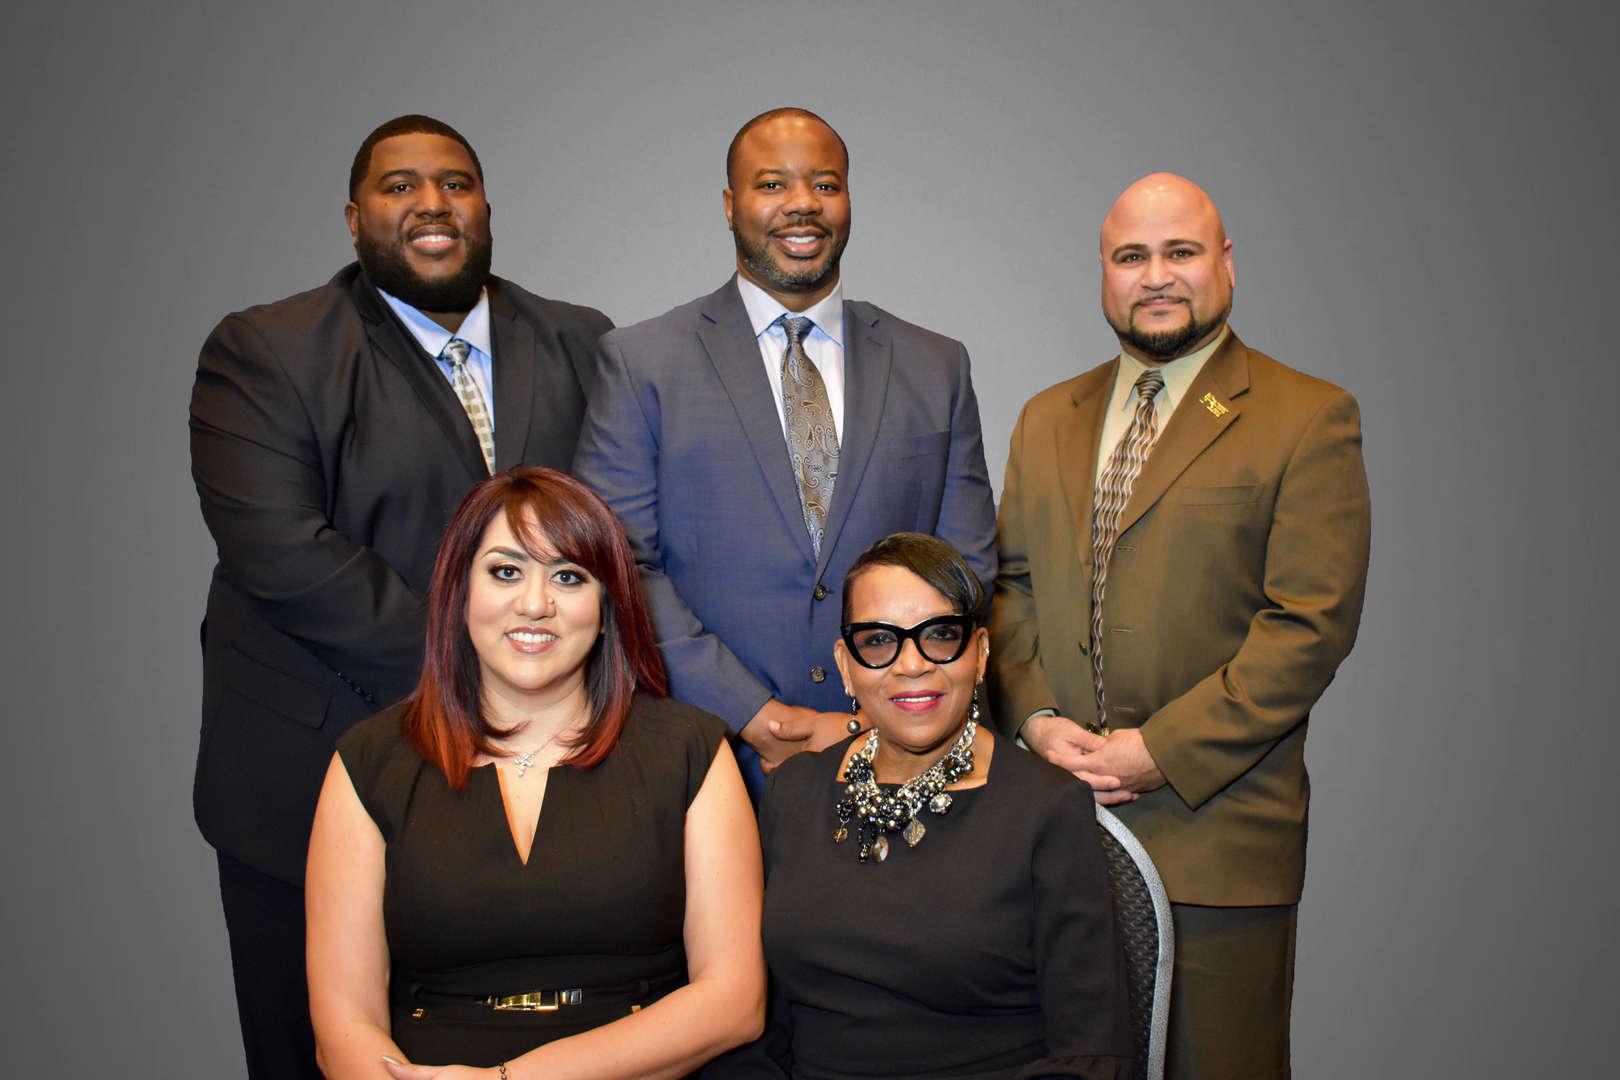 Back left to right;  Anton Williams, Dwayne Rancifer Jr., Joel Rodriguez  FRONT left to right; Vanessa Hernandez-Orange, Diane Smith